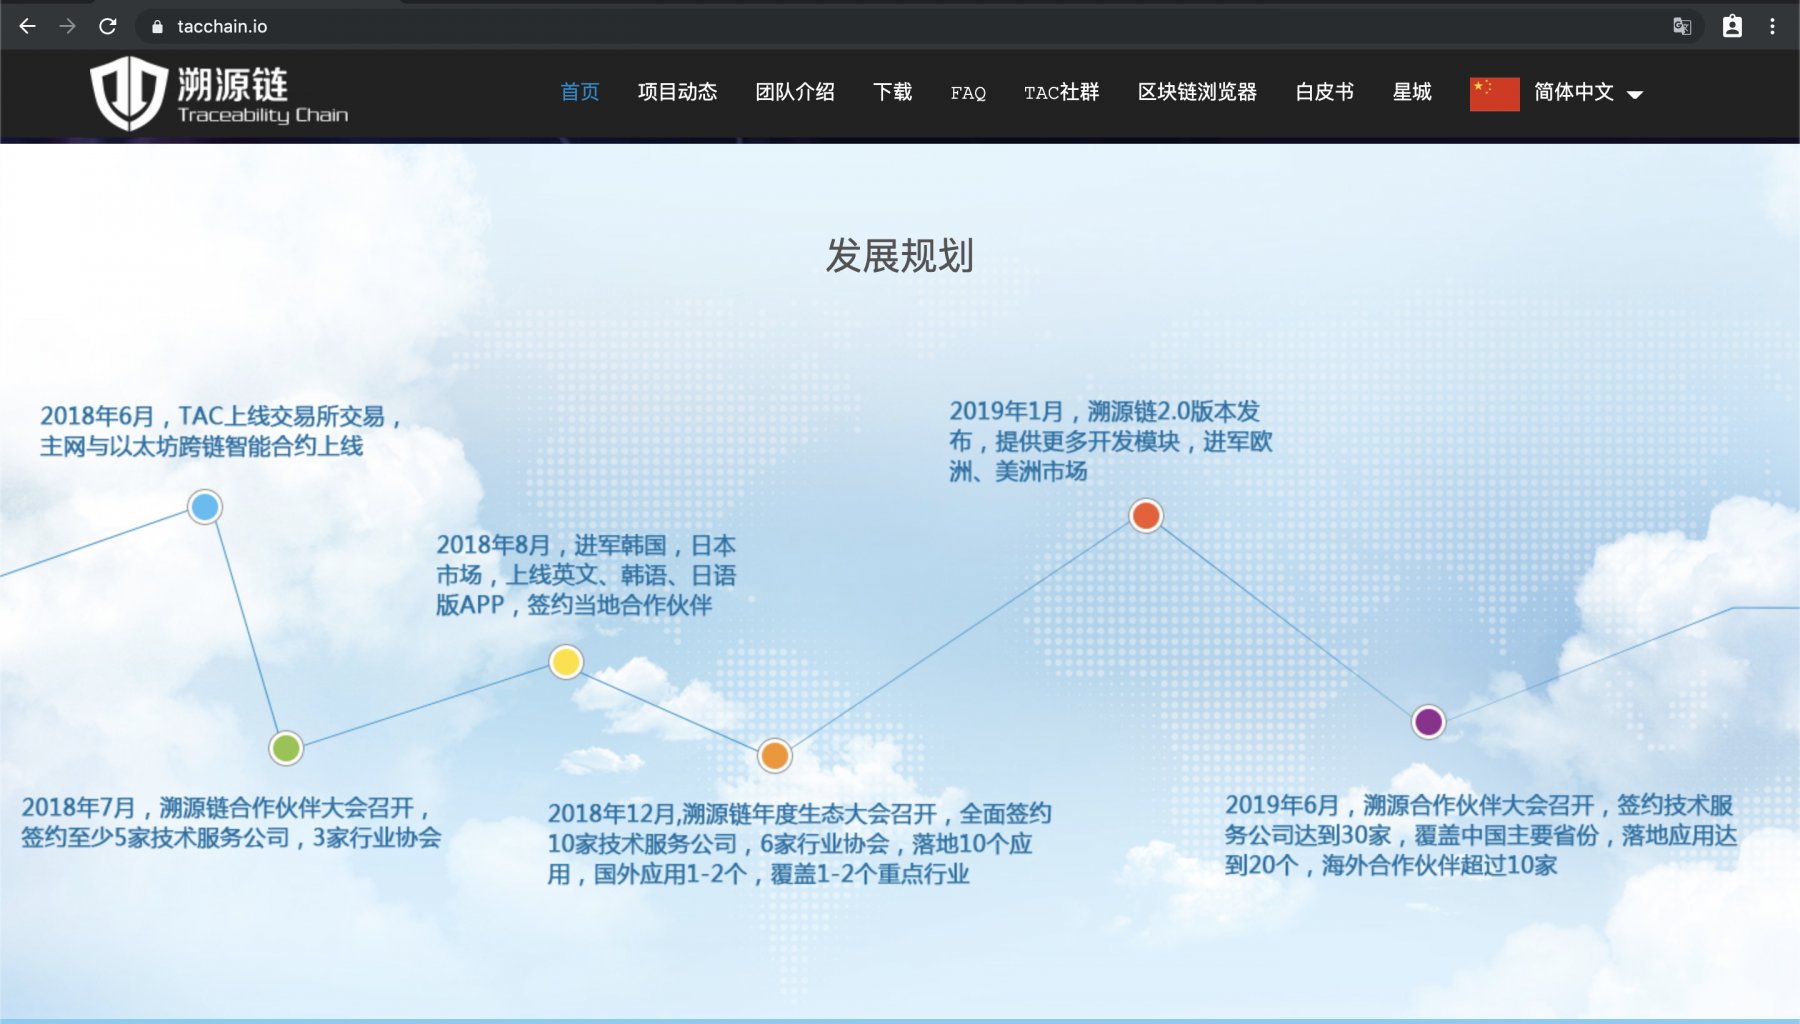 Screenshot of roadmap from TAC website